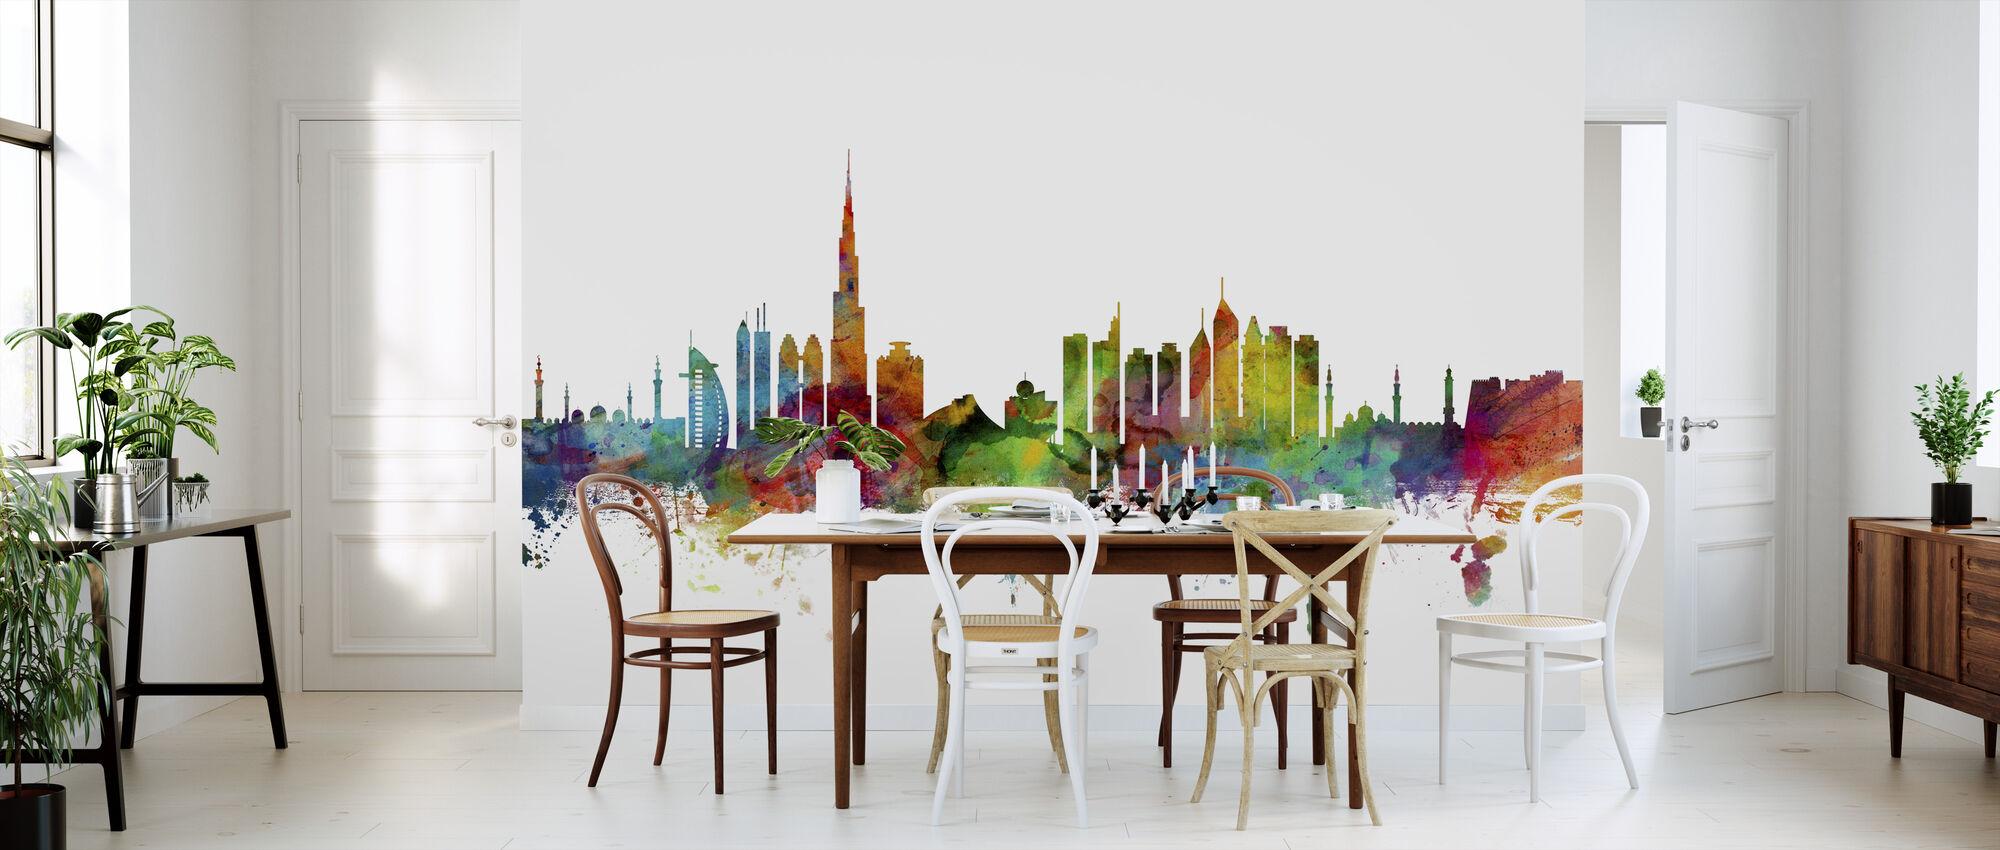 Dubai Skyline - Wallpaper - Kitchen